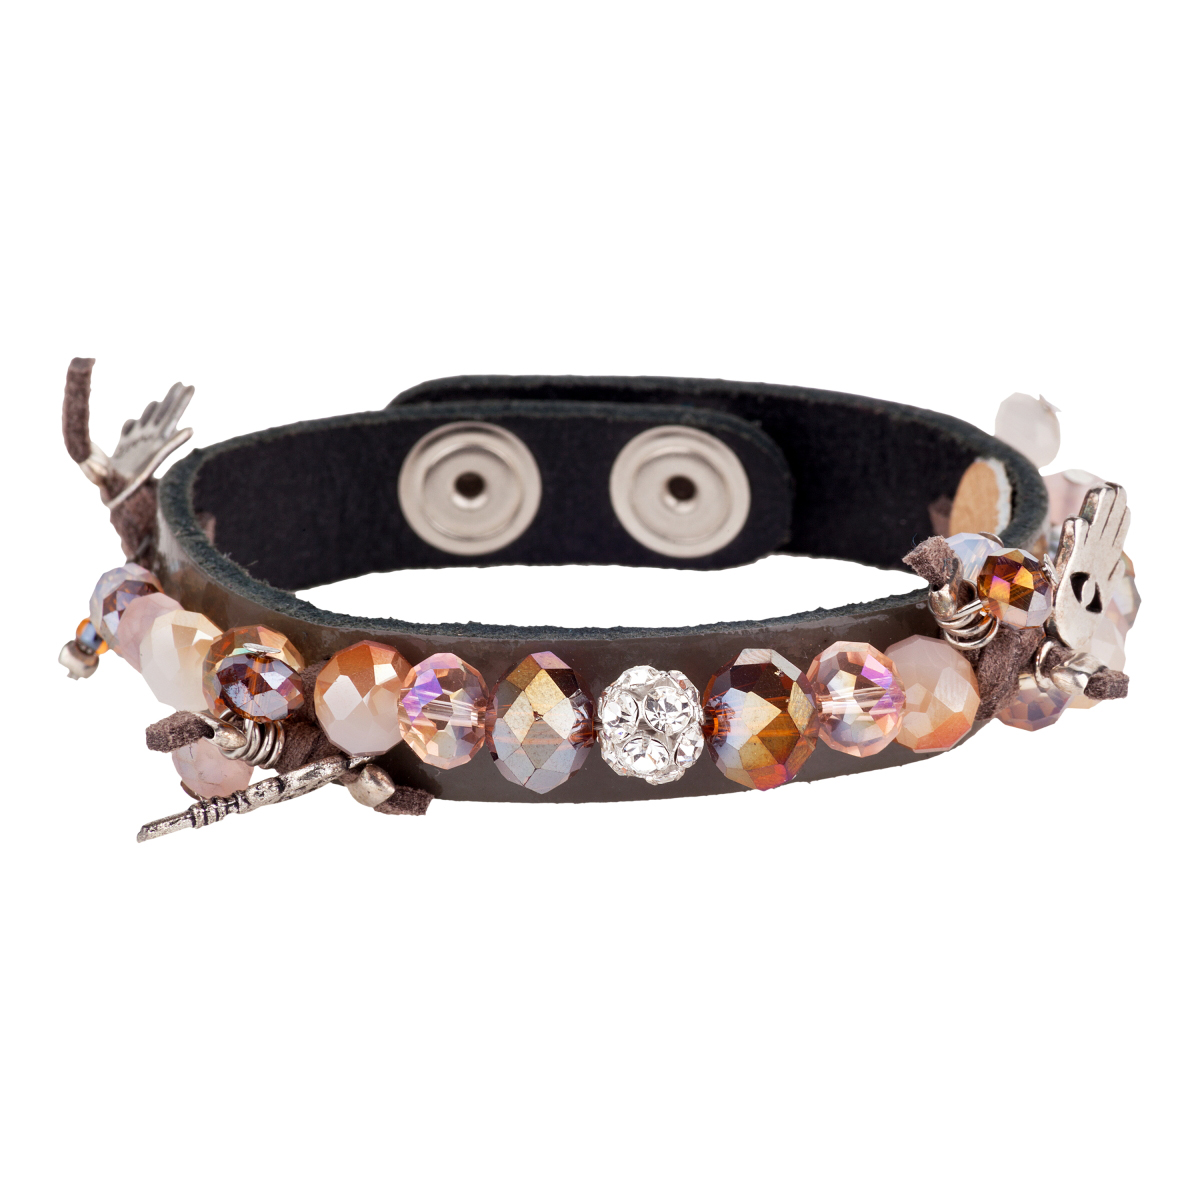 IRIS: Sandy shades leather bracelet | Accessories,Jewelry > Bracelets,Jewelry -  Hiphunters Shop